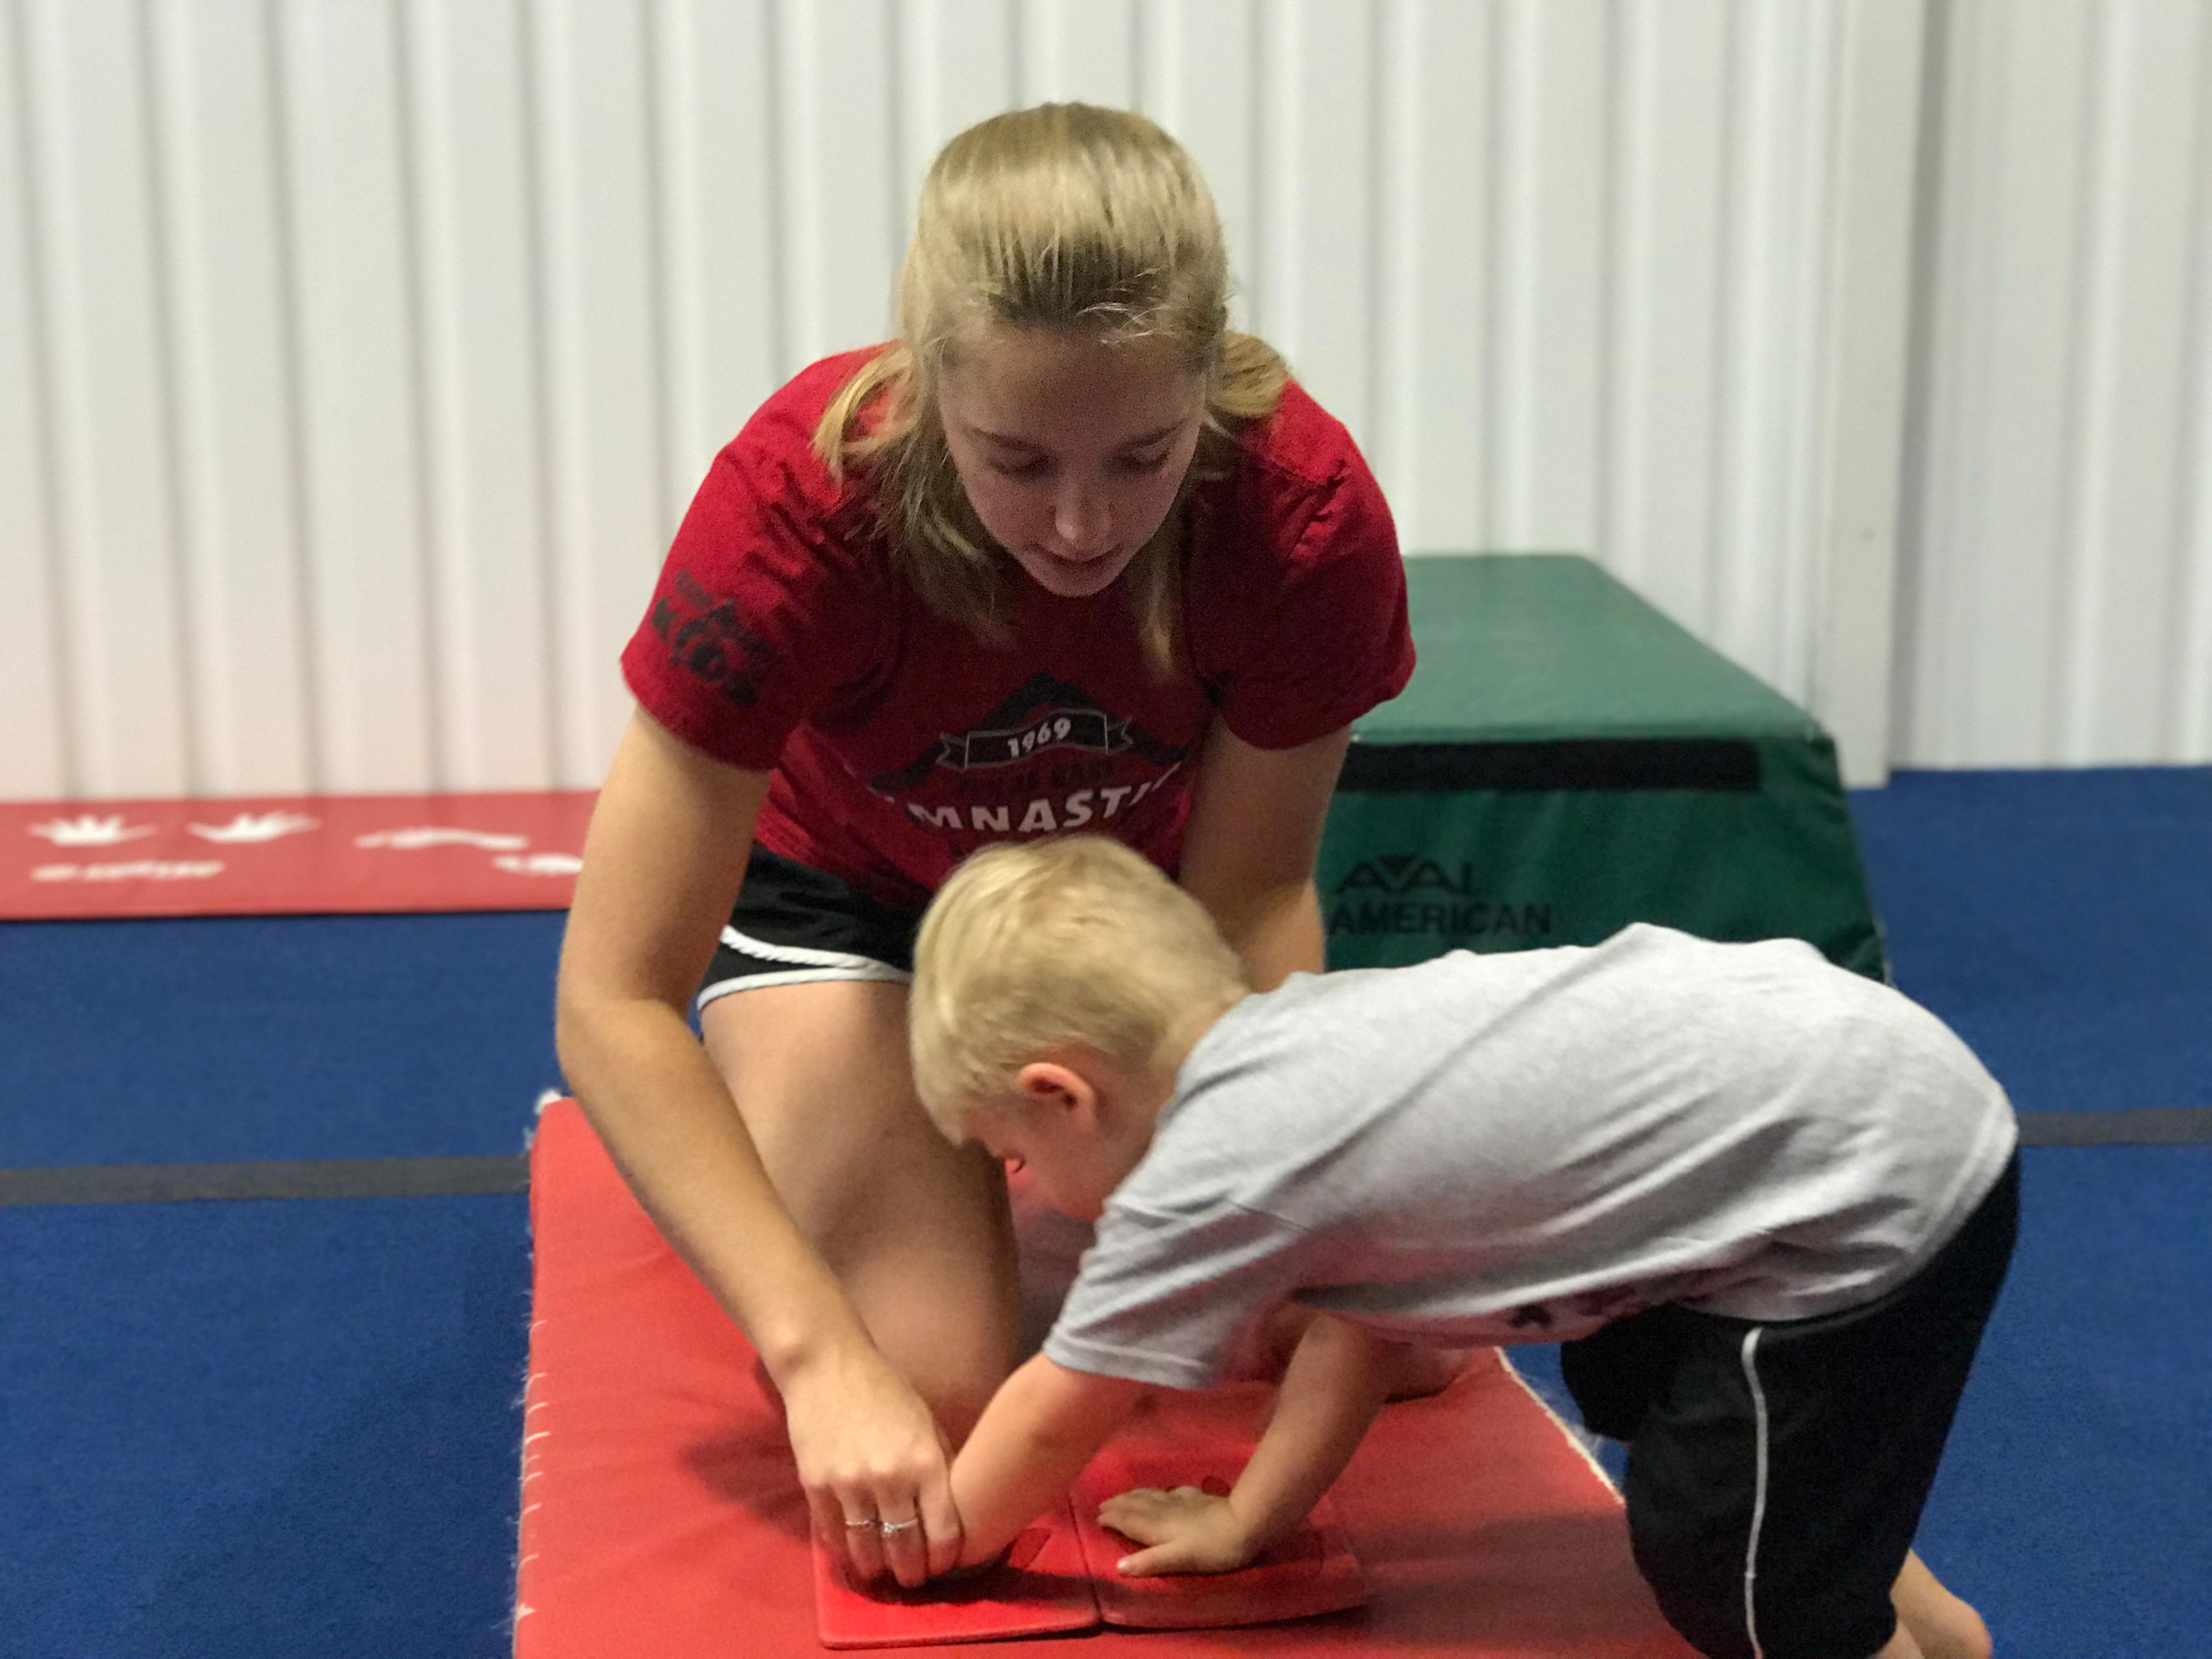 Texas East Gymnastics image 12